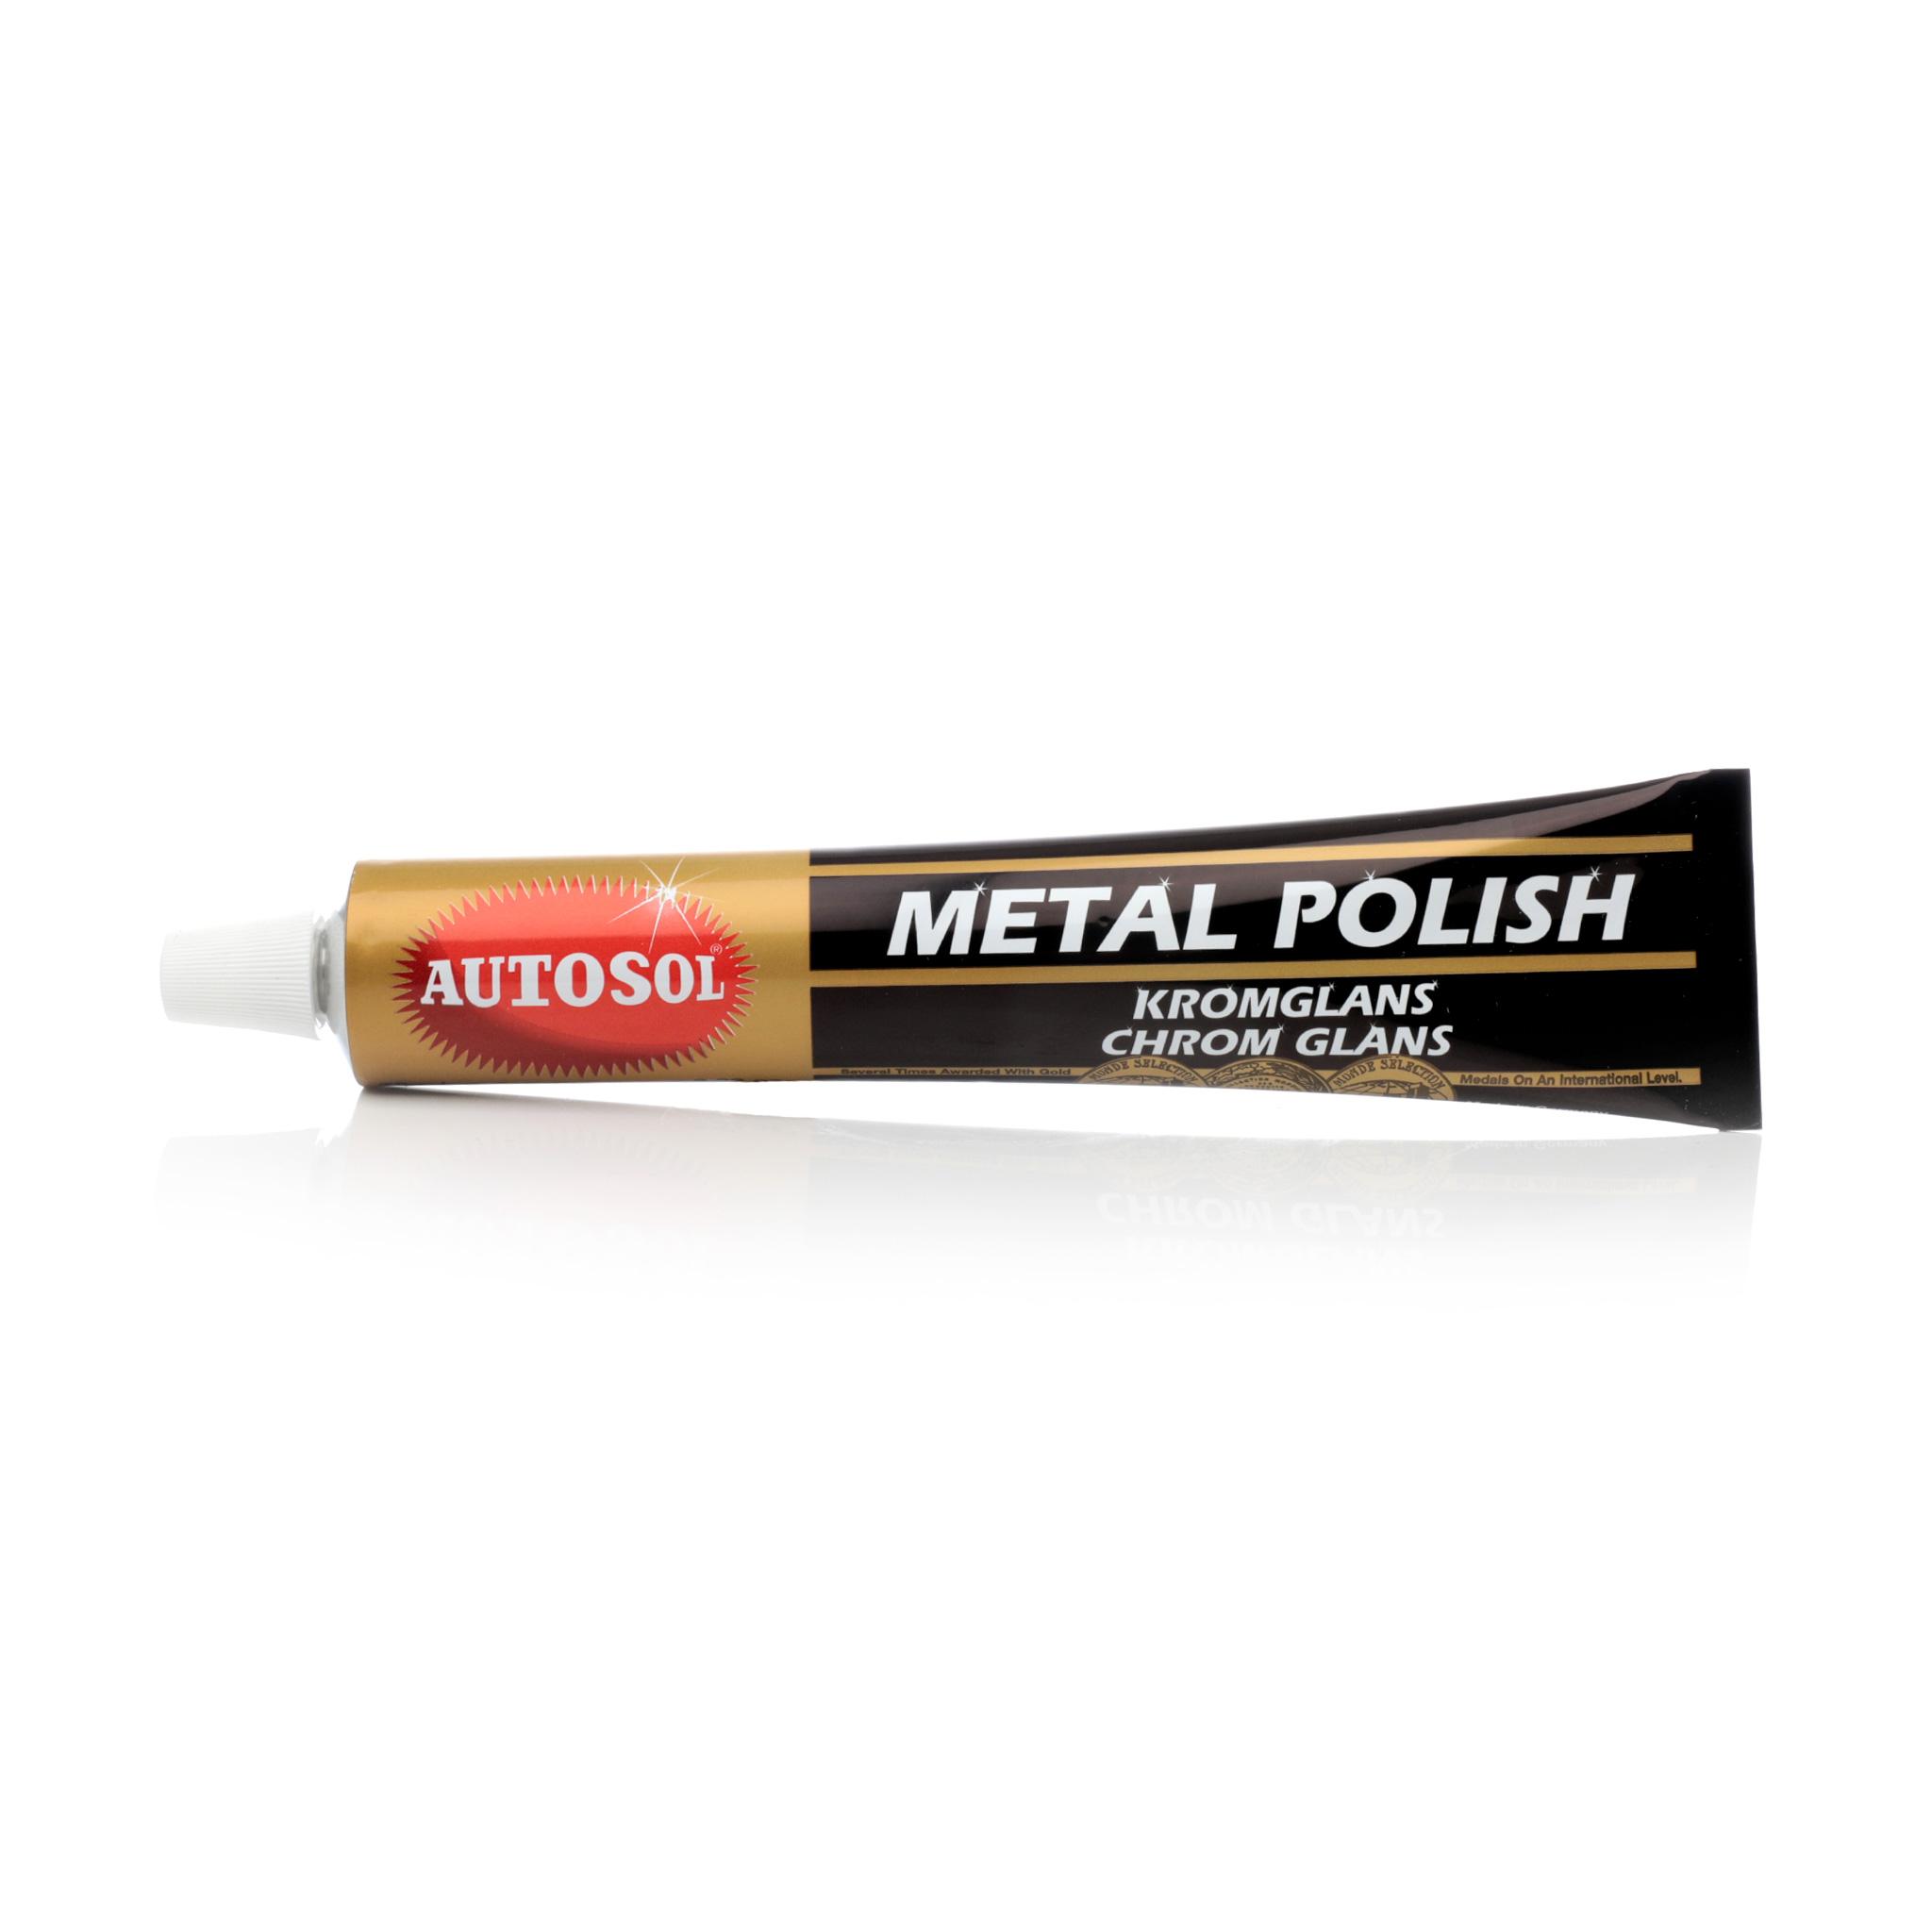 Metallpolermedel Autosol Kromglans, 75 ml